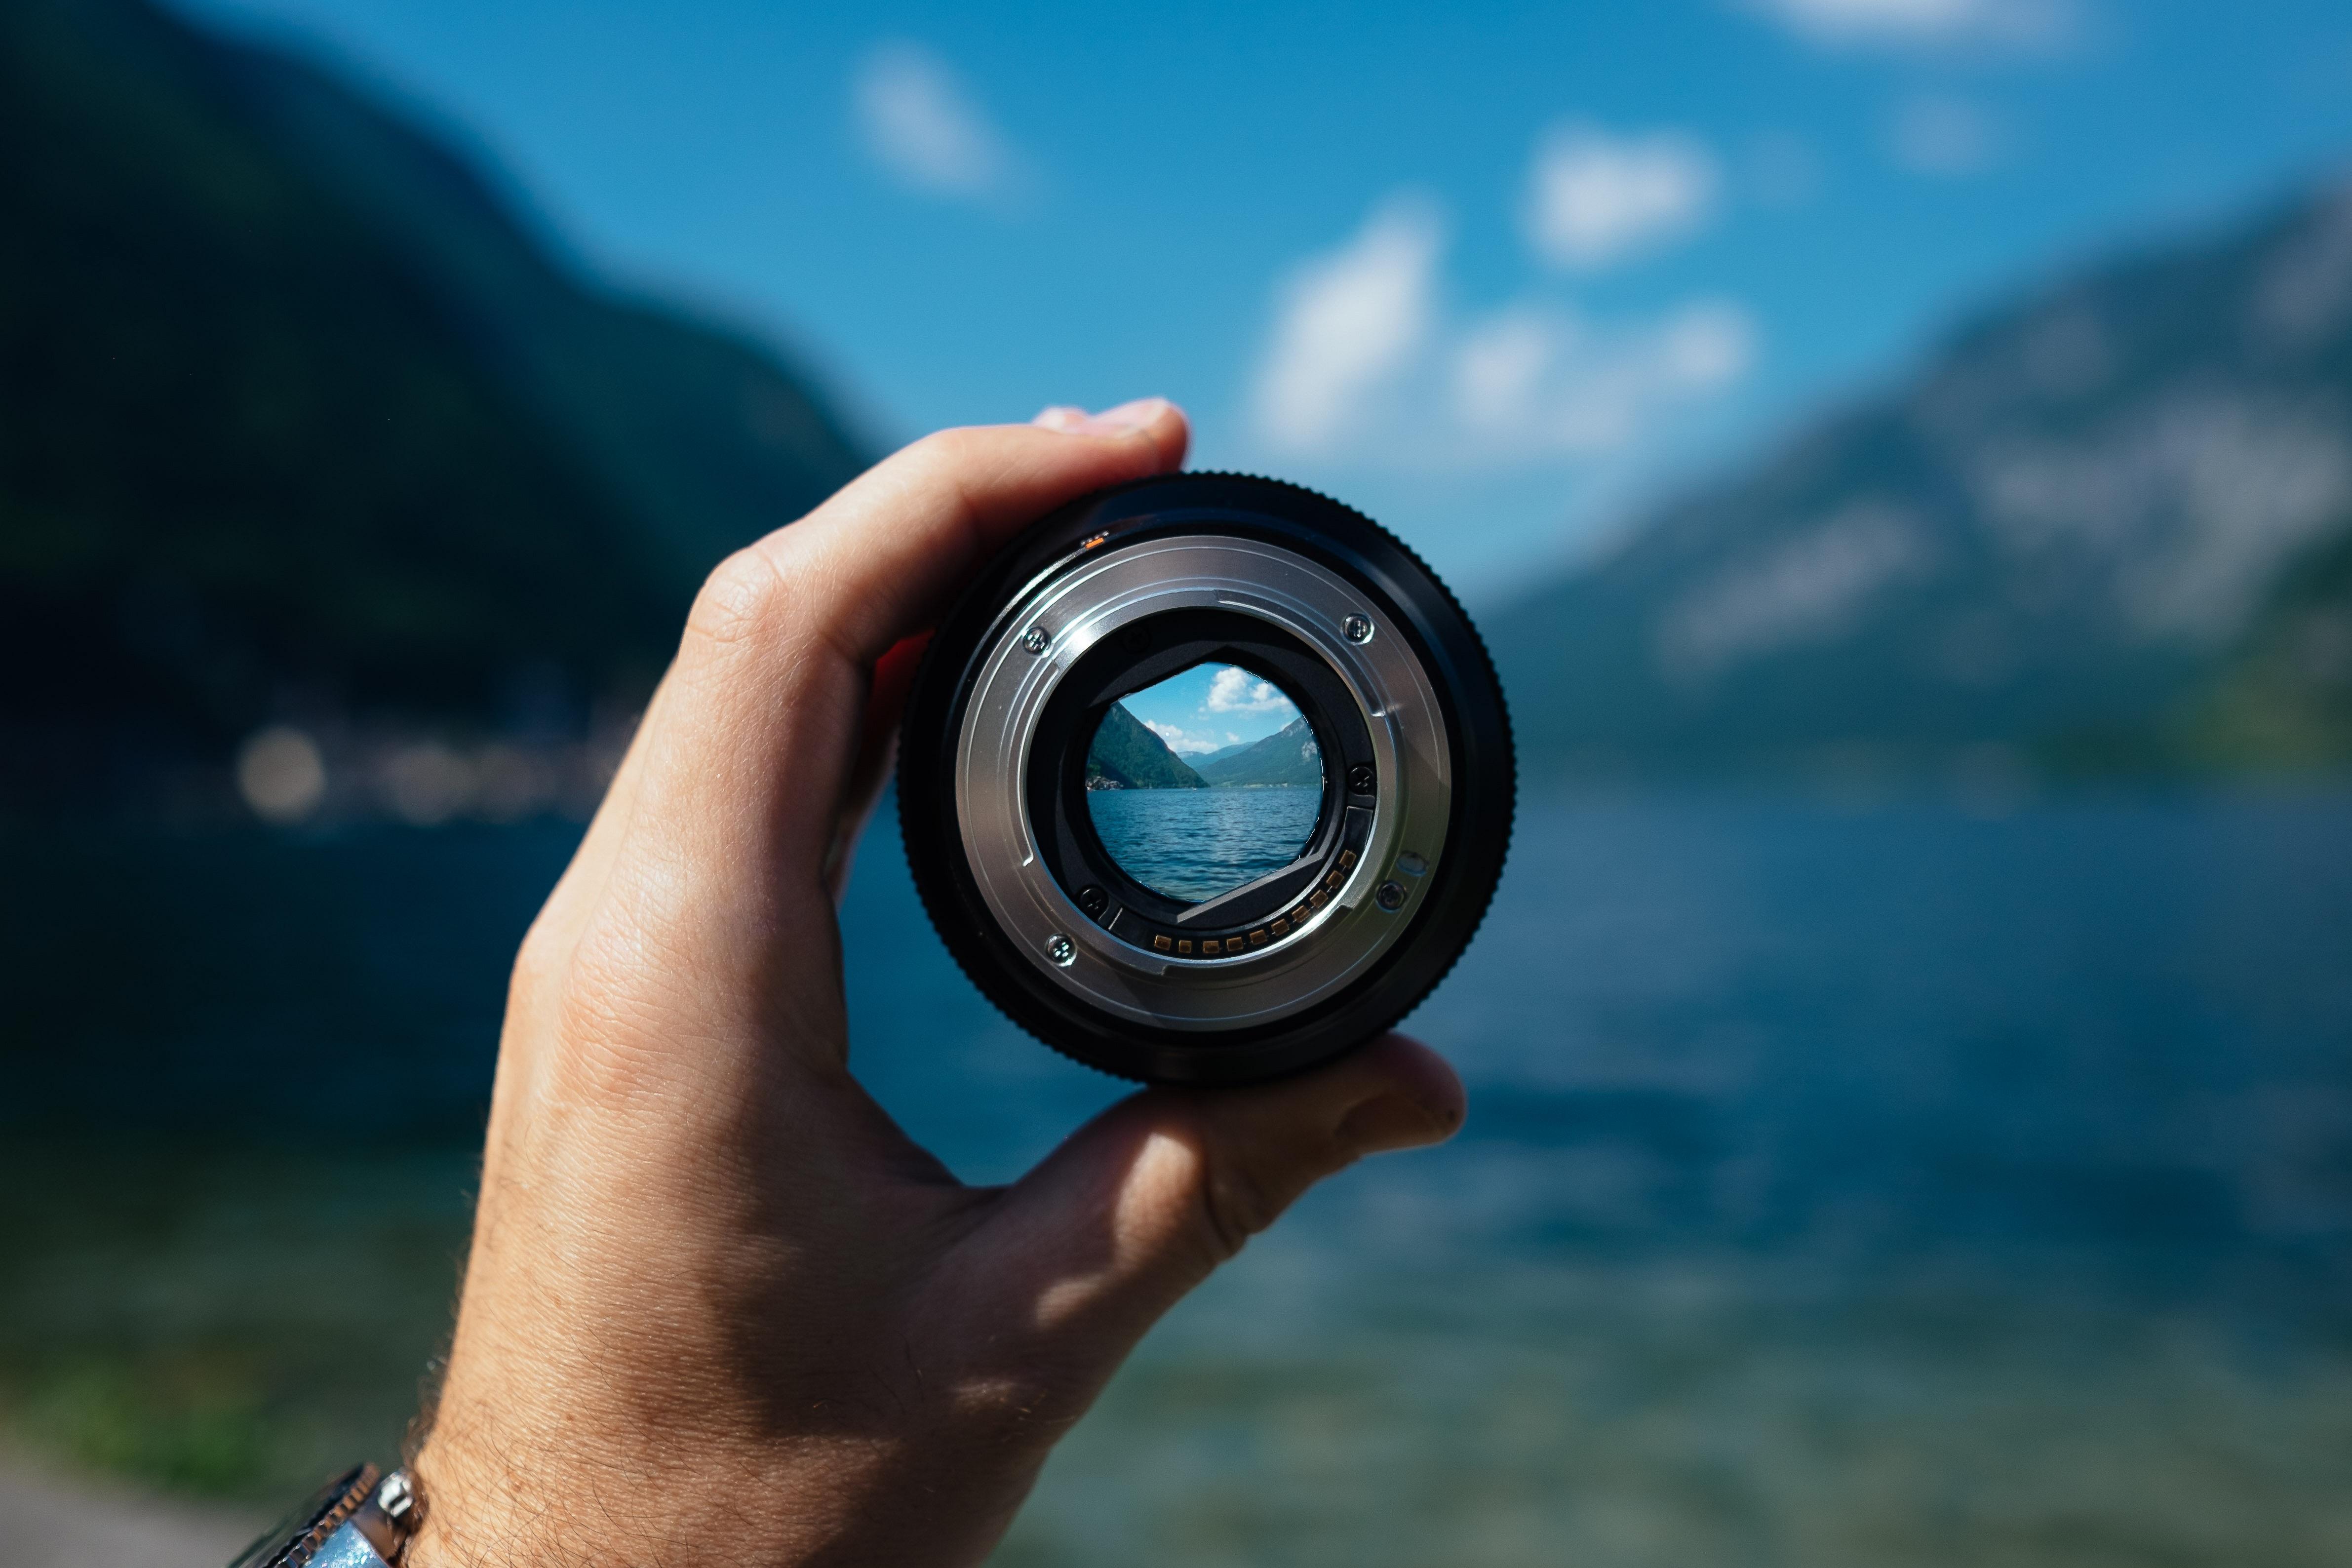 фото человеческого глаза на фотоаппарате фото сессии посадил